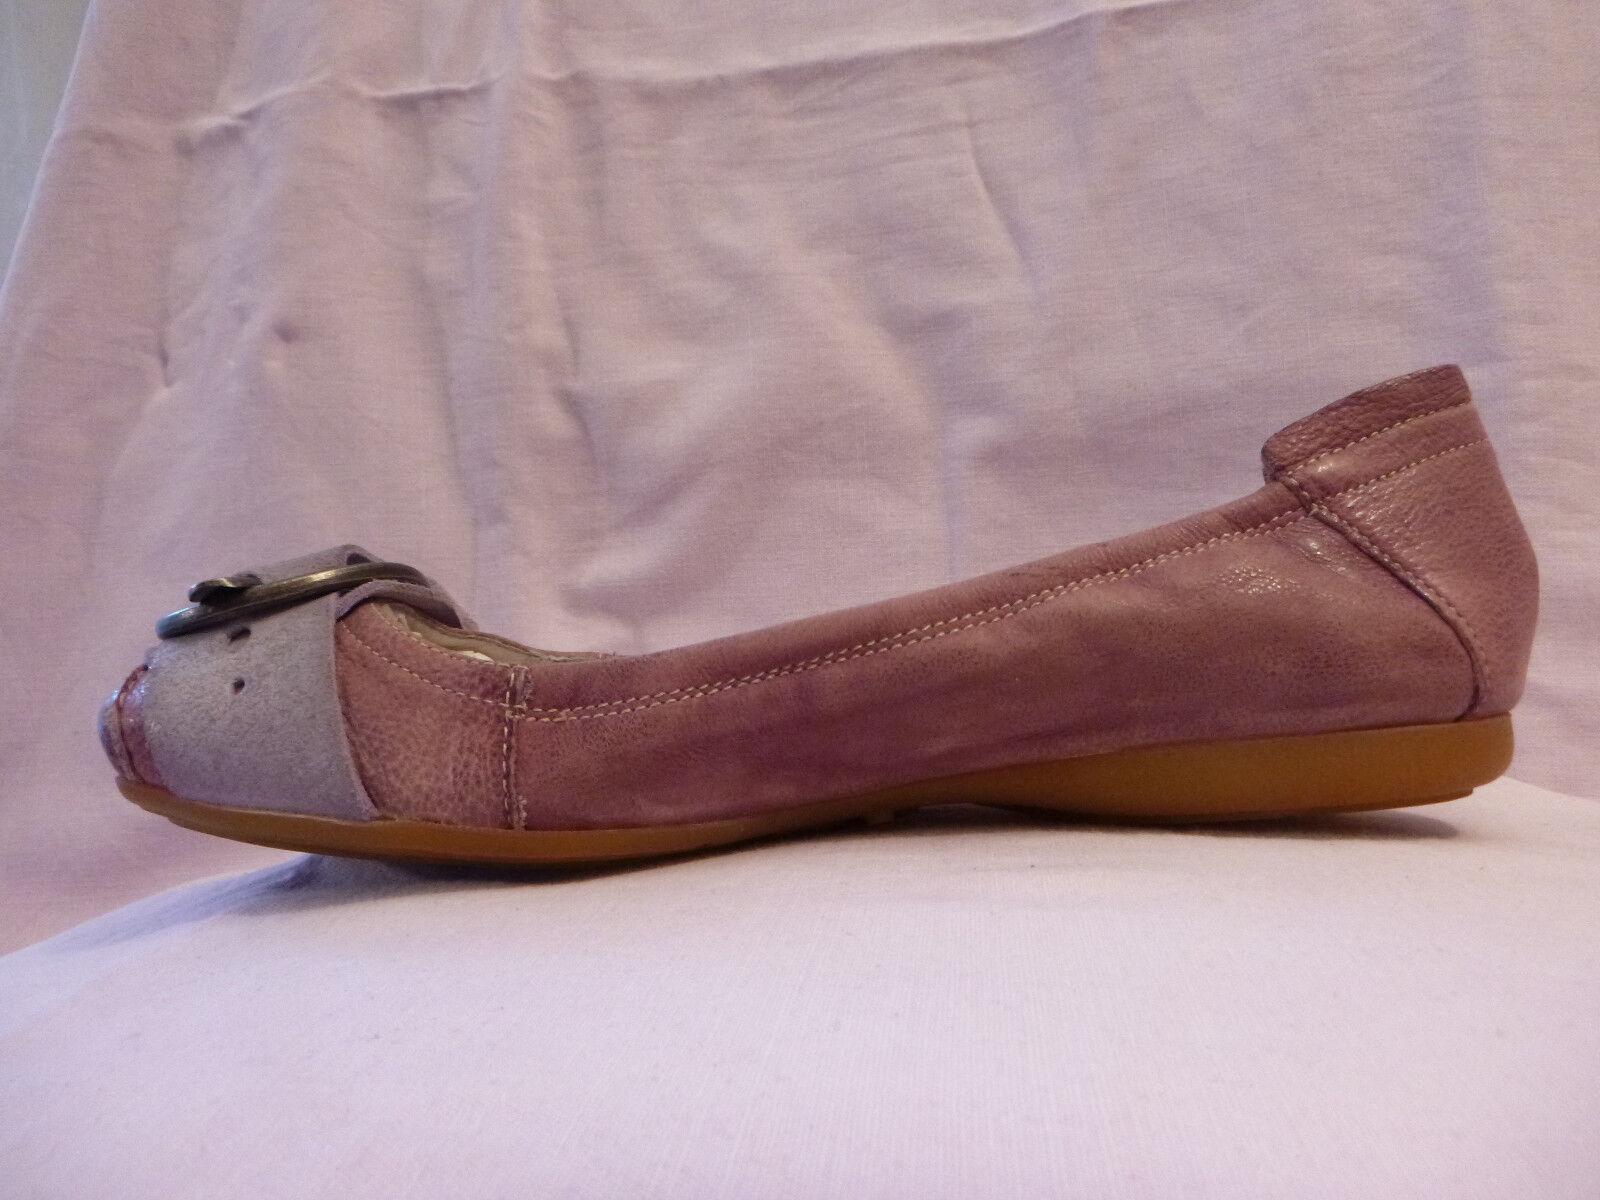 NEU NEU NEU  Salamander- rosa-flieder flexible Ballerinas Leder 37 4861ec